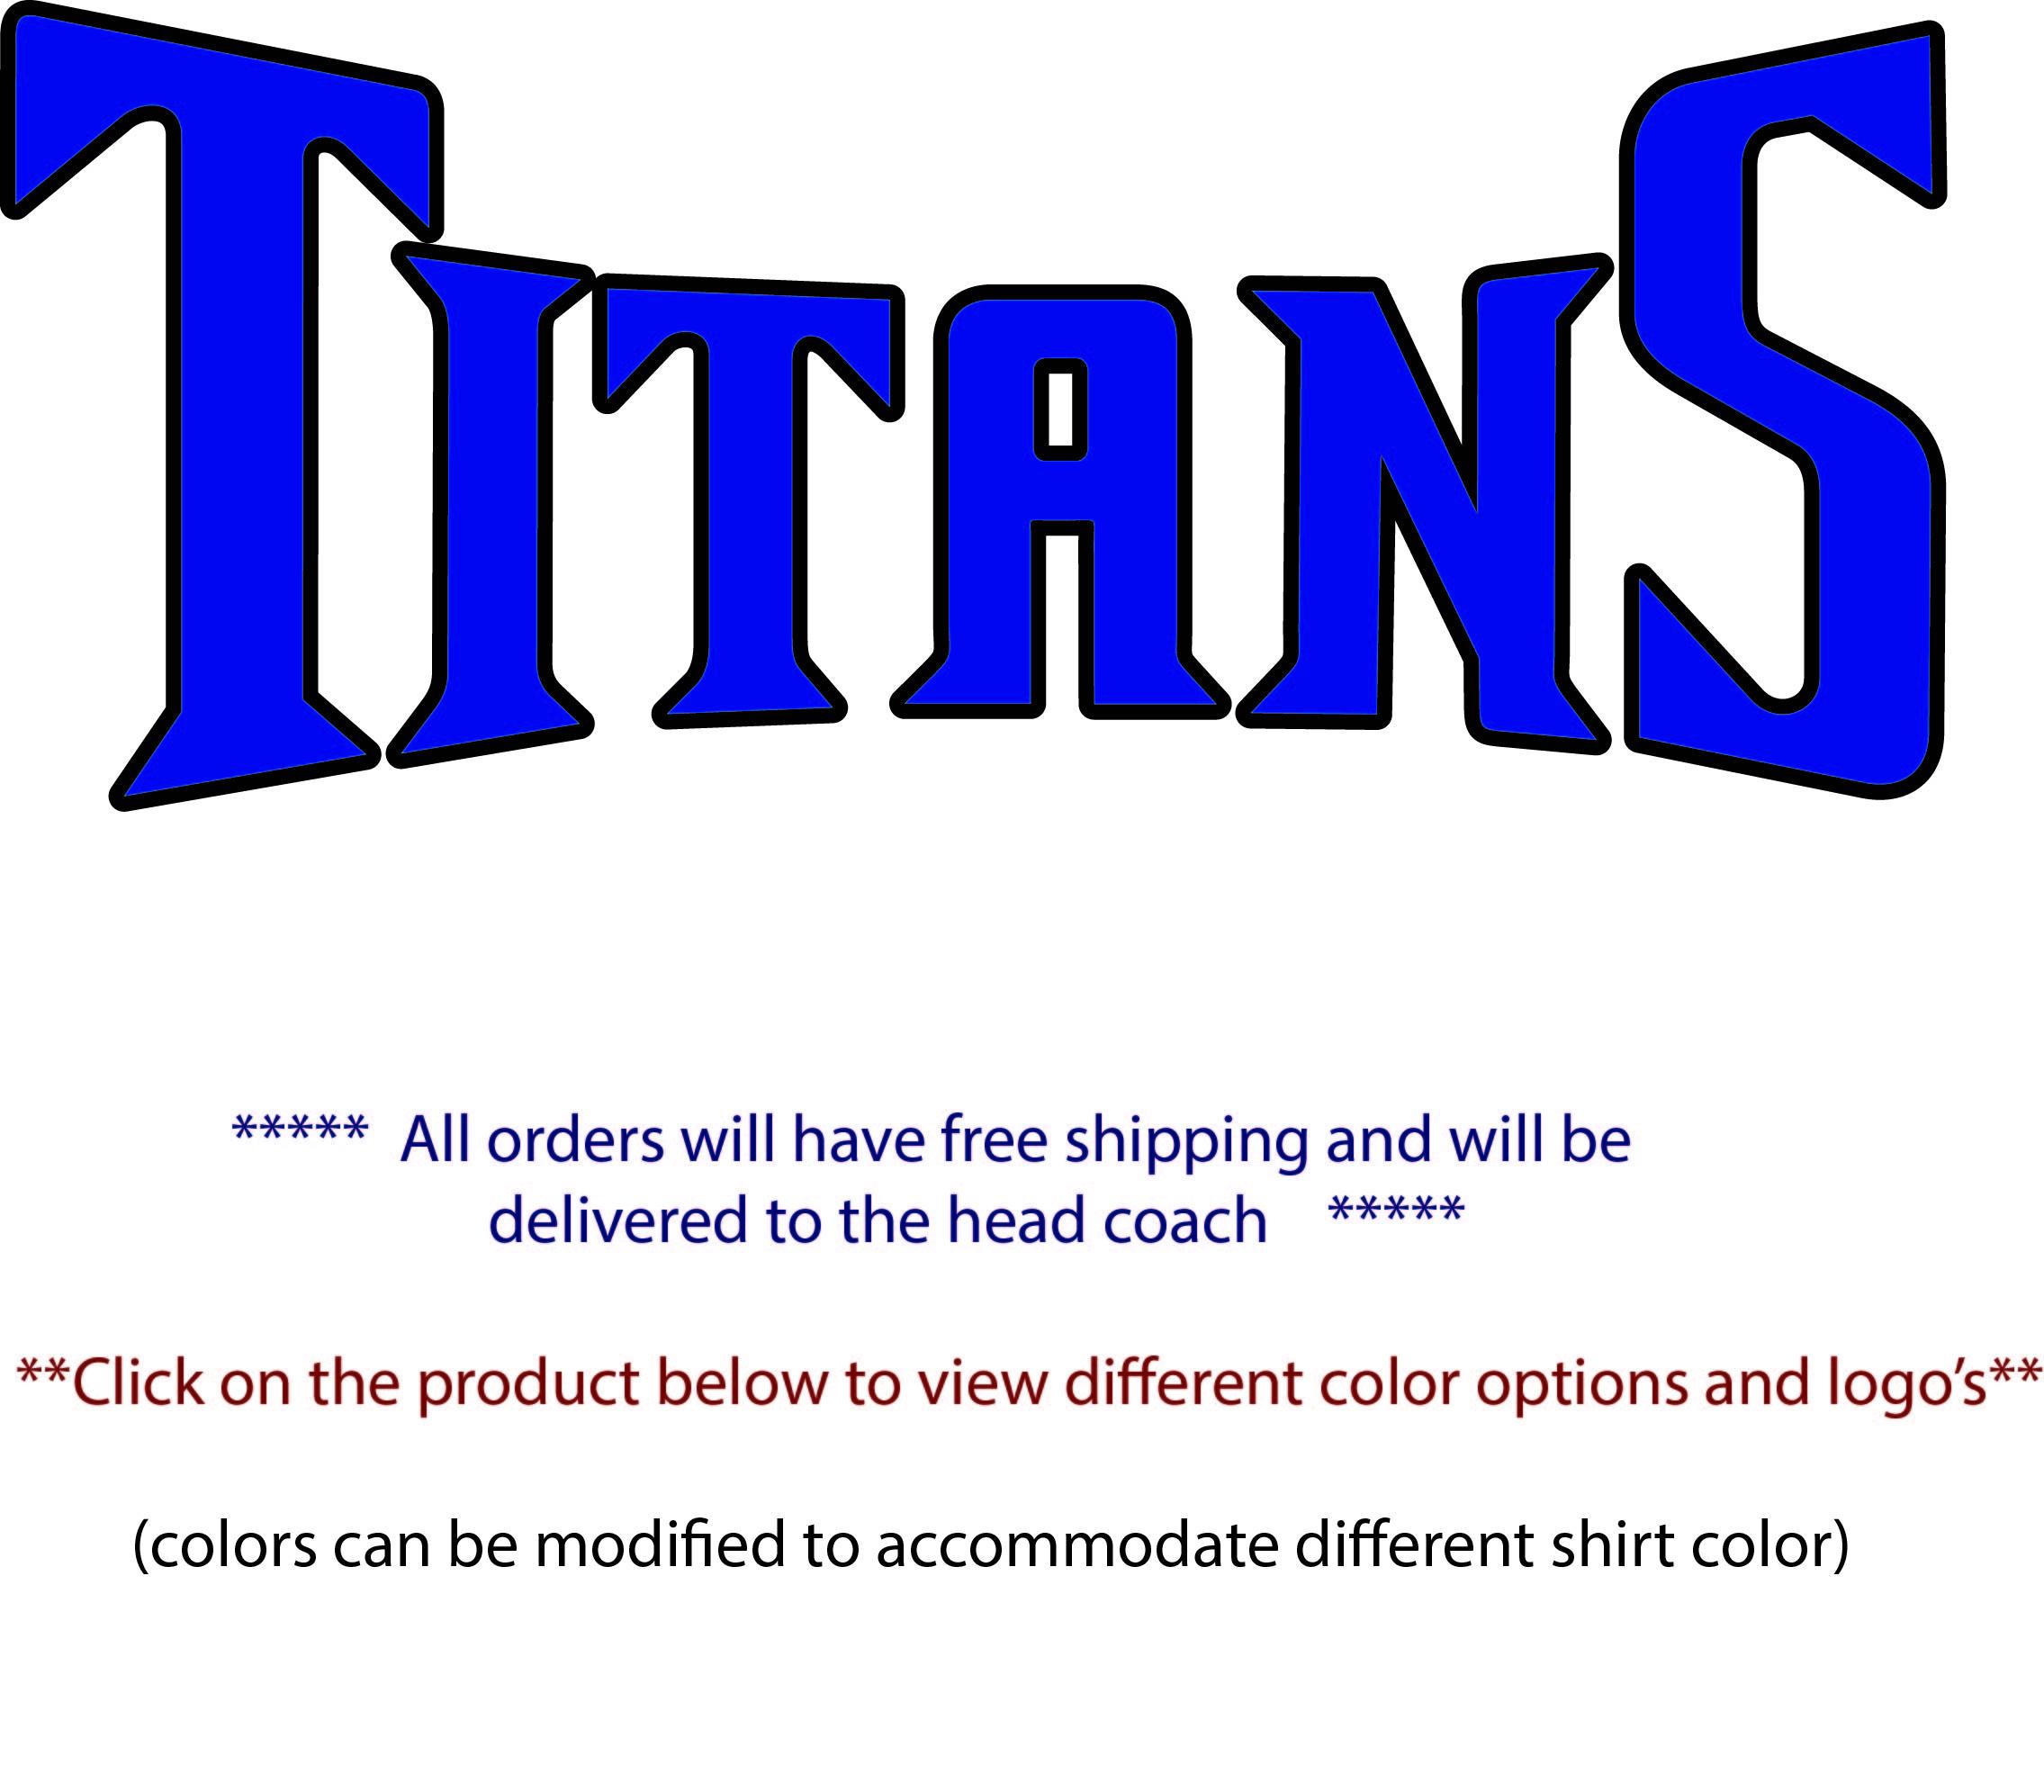 titans-web-site-header.jpg